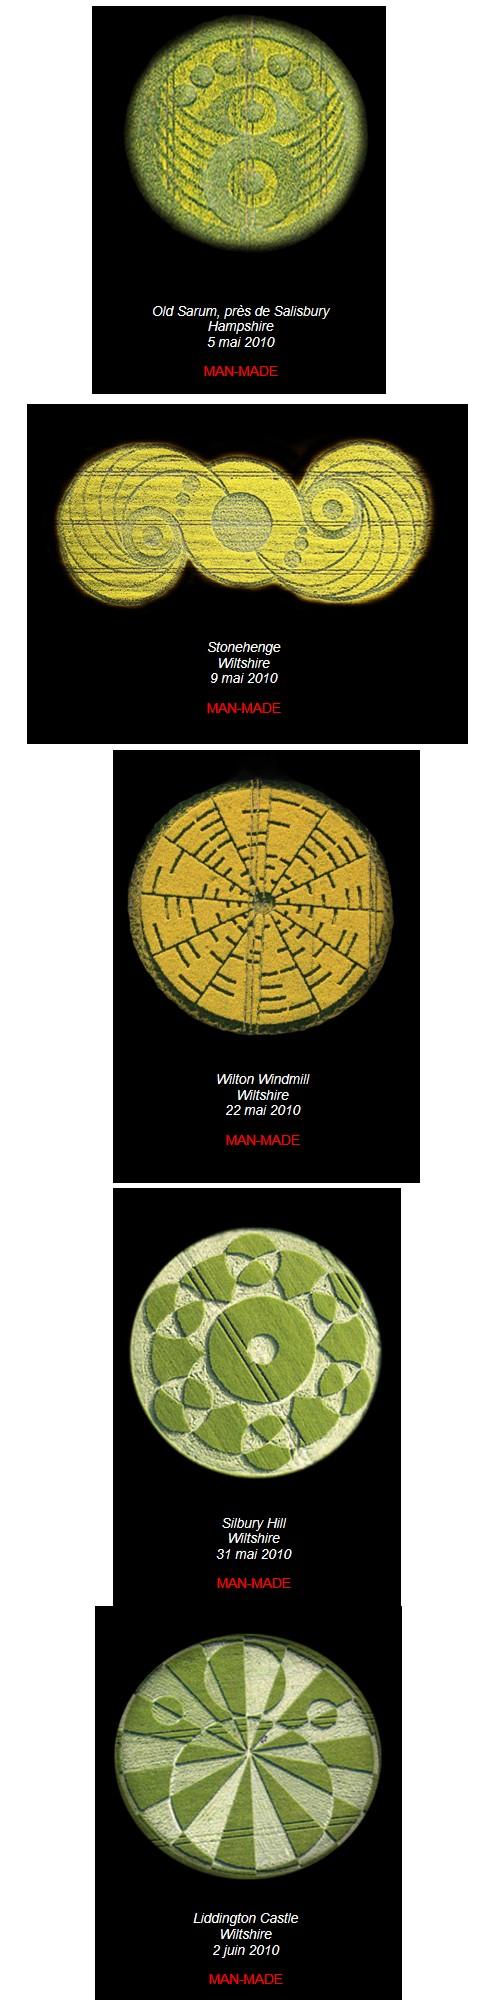 Crop Circles 2013. - Page 18 Cultur10